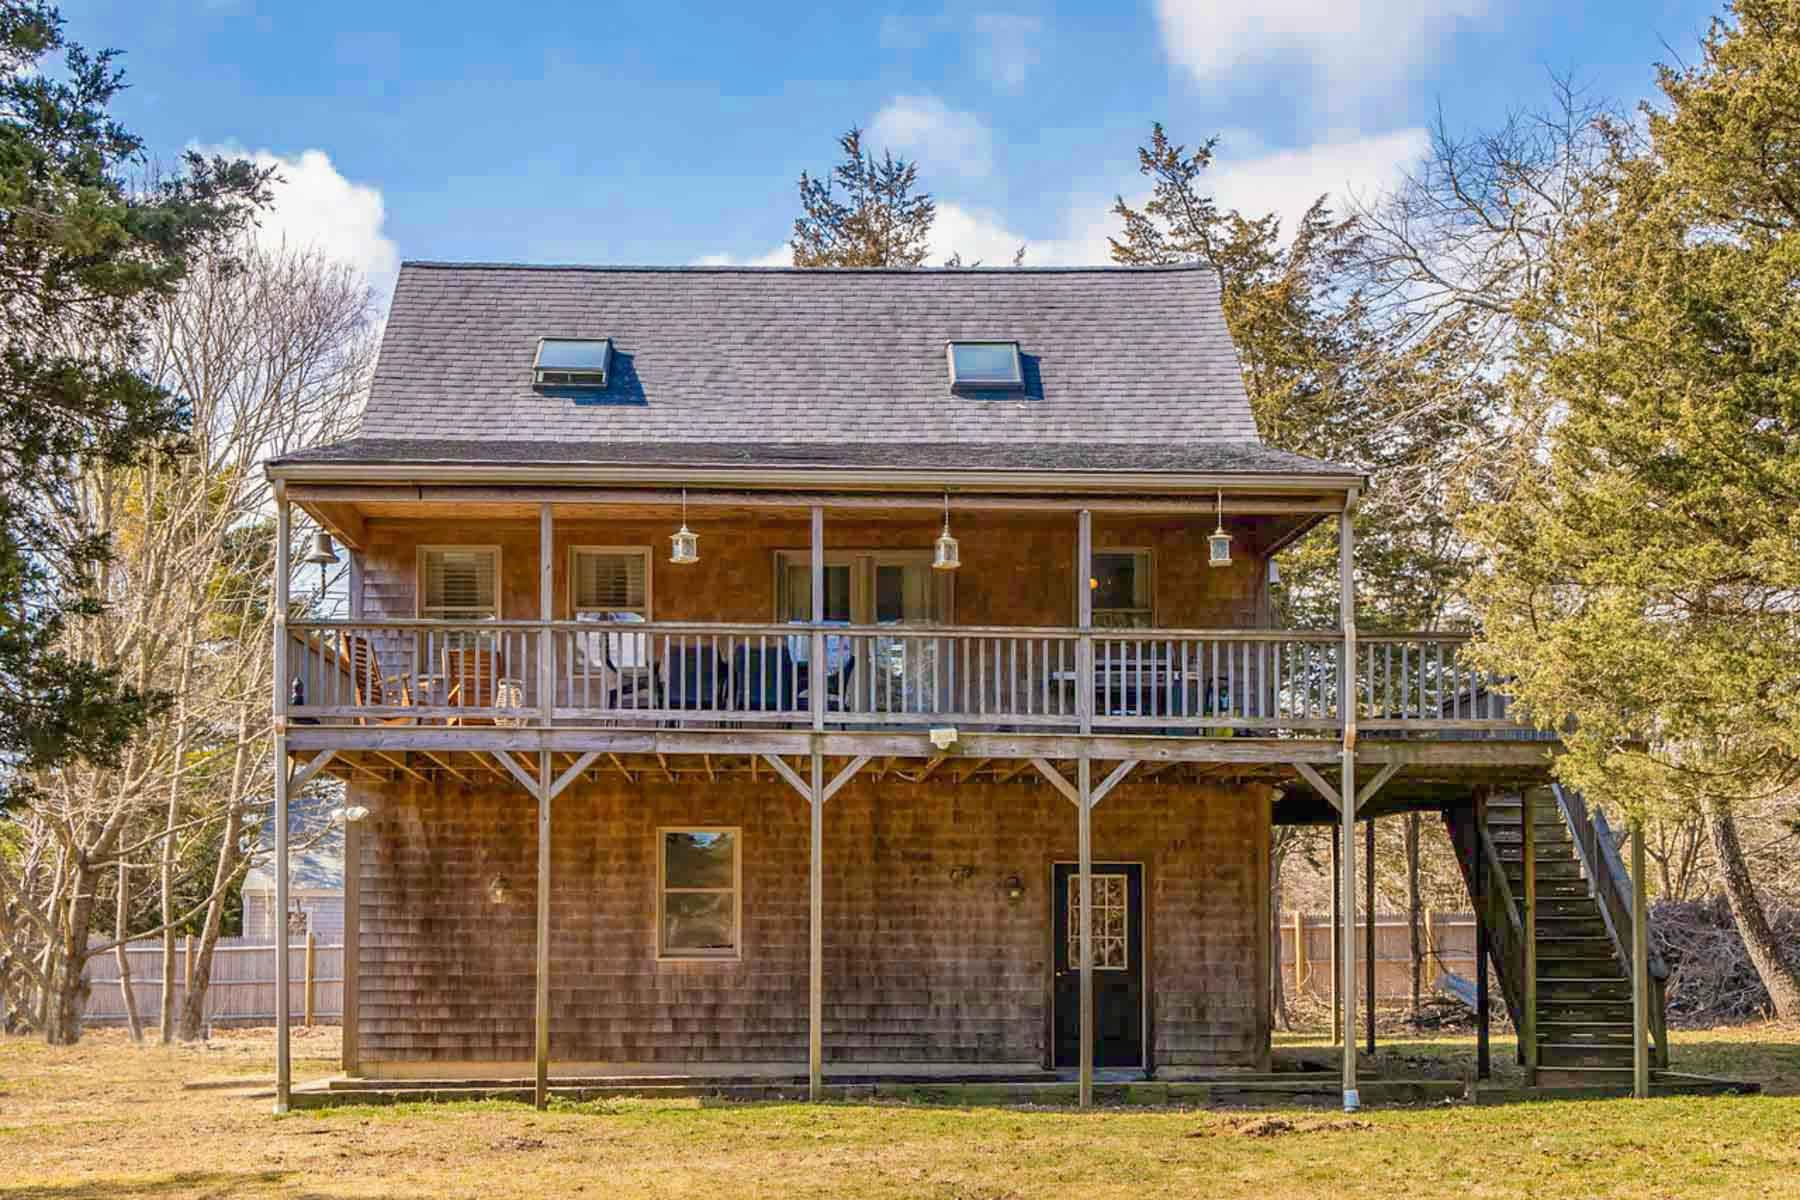 Single Family Homes 为 销售 在 House with garage in Oak Bluffs 179 Edgartow Vineyard Haven Road 橡树崖镇, 马萨诸塞州 02557 美国